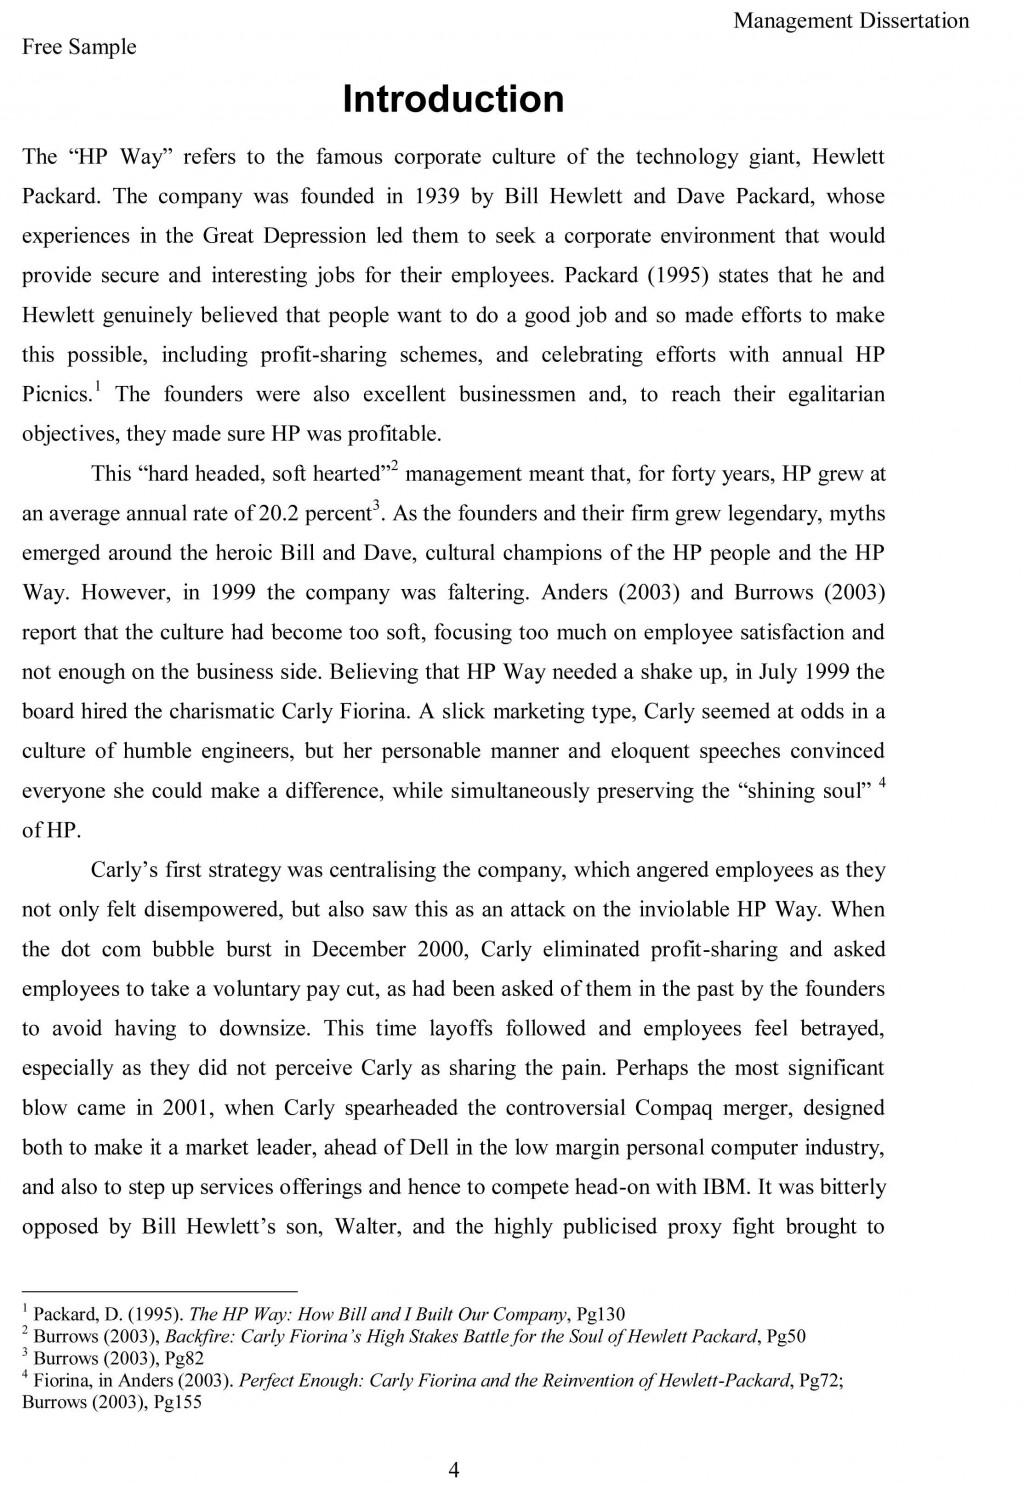 008 Unusual Essay Paper High Resolution  Upsc 2019 In Hindi Pdf Format Cs Past 2018Large